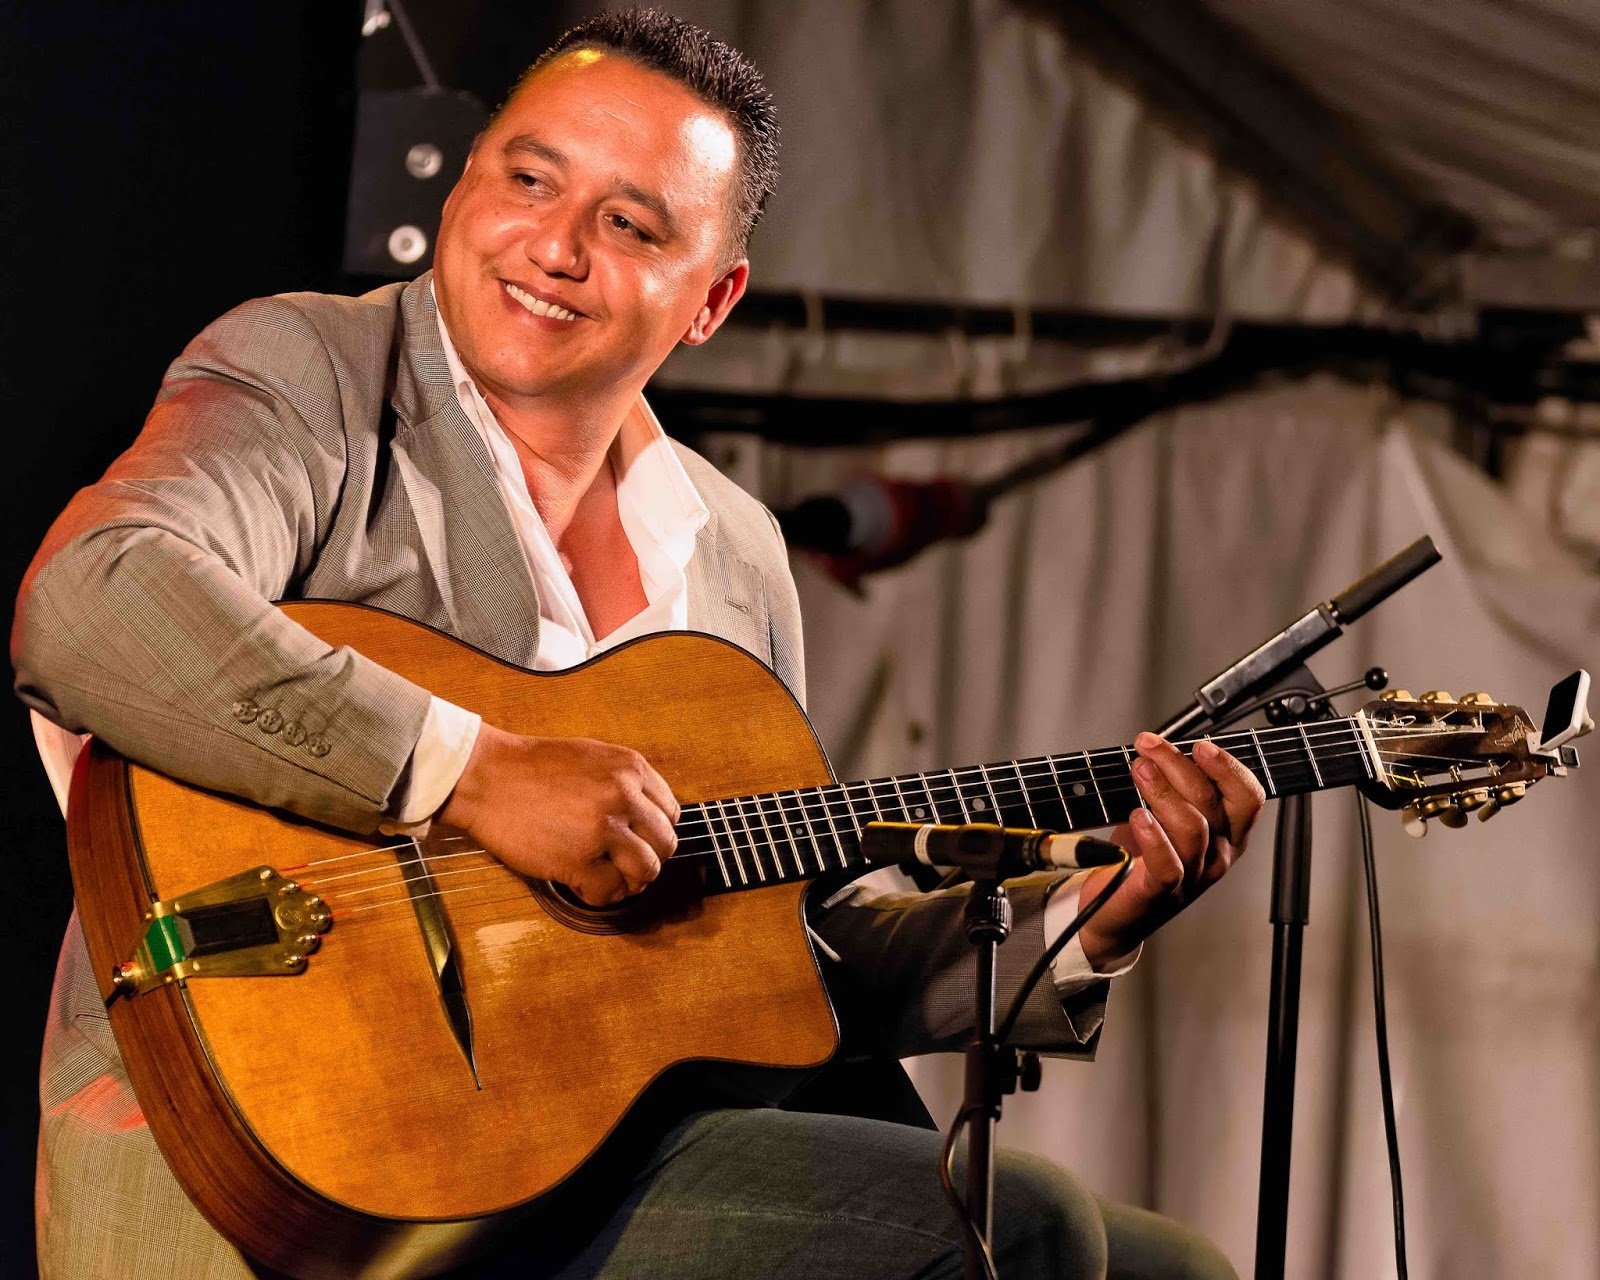 Guitarra Manouche : Paulus Schäfer - Entrevista